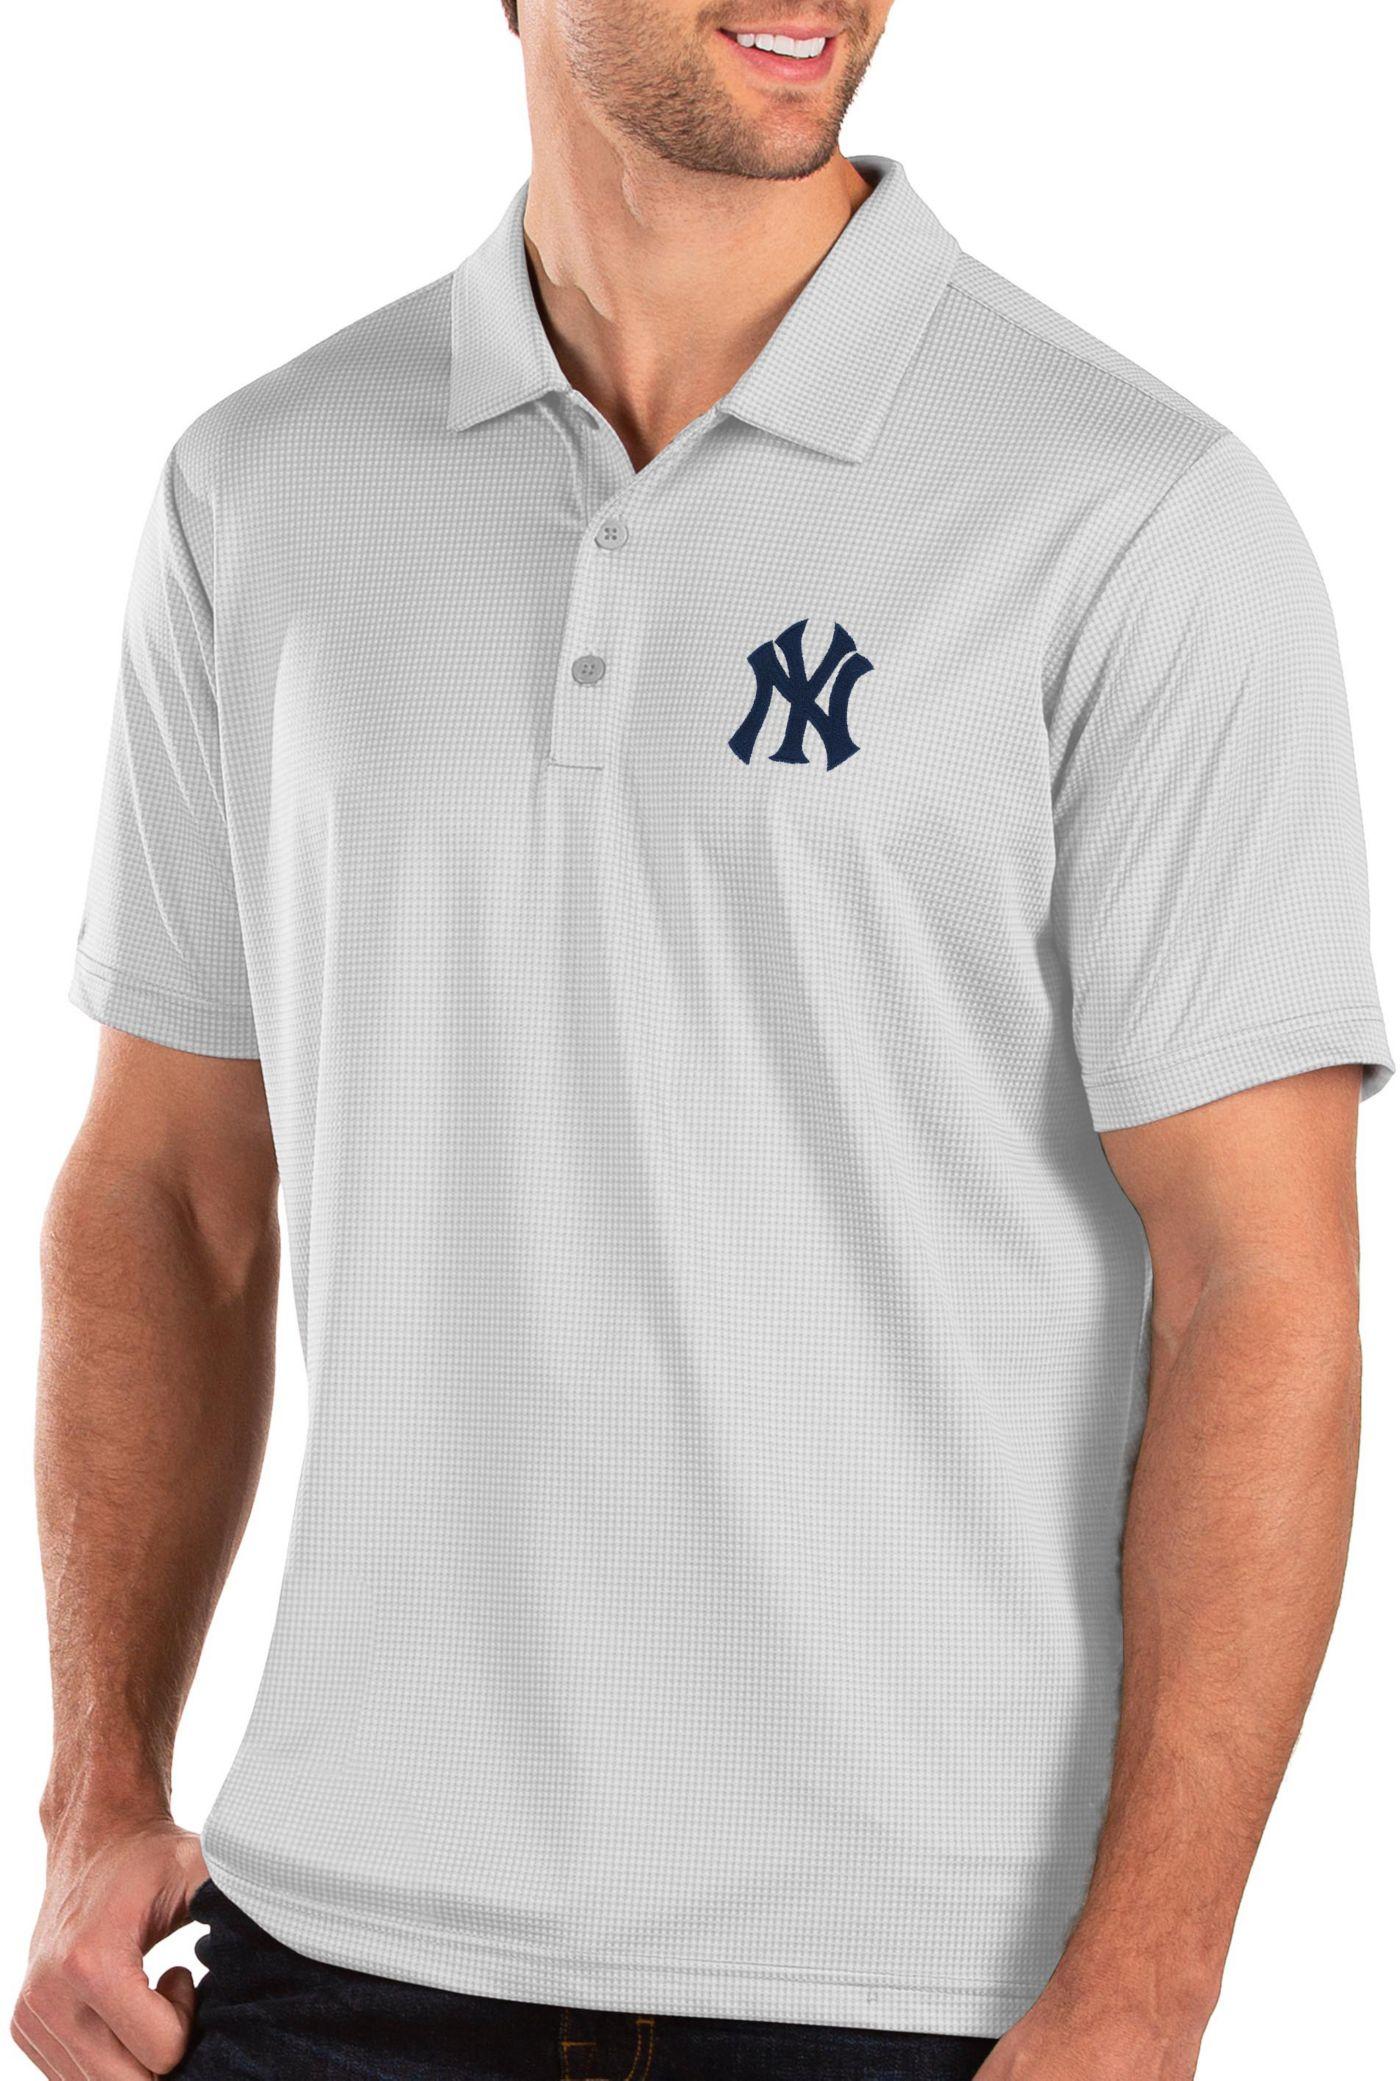 Antigua Men's New York Yankees White Balance Polo